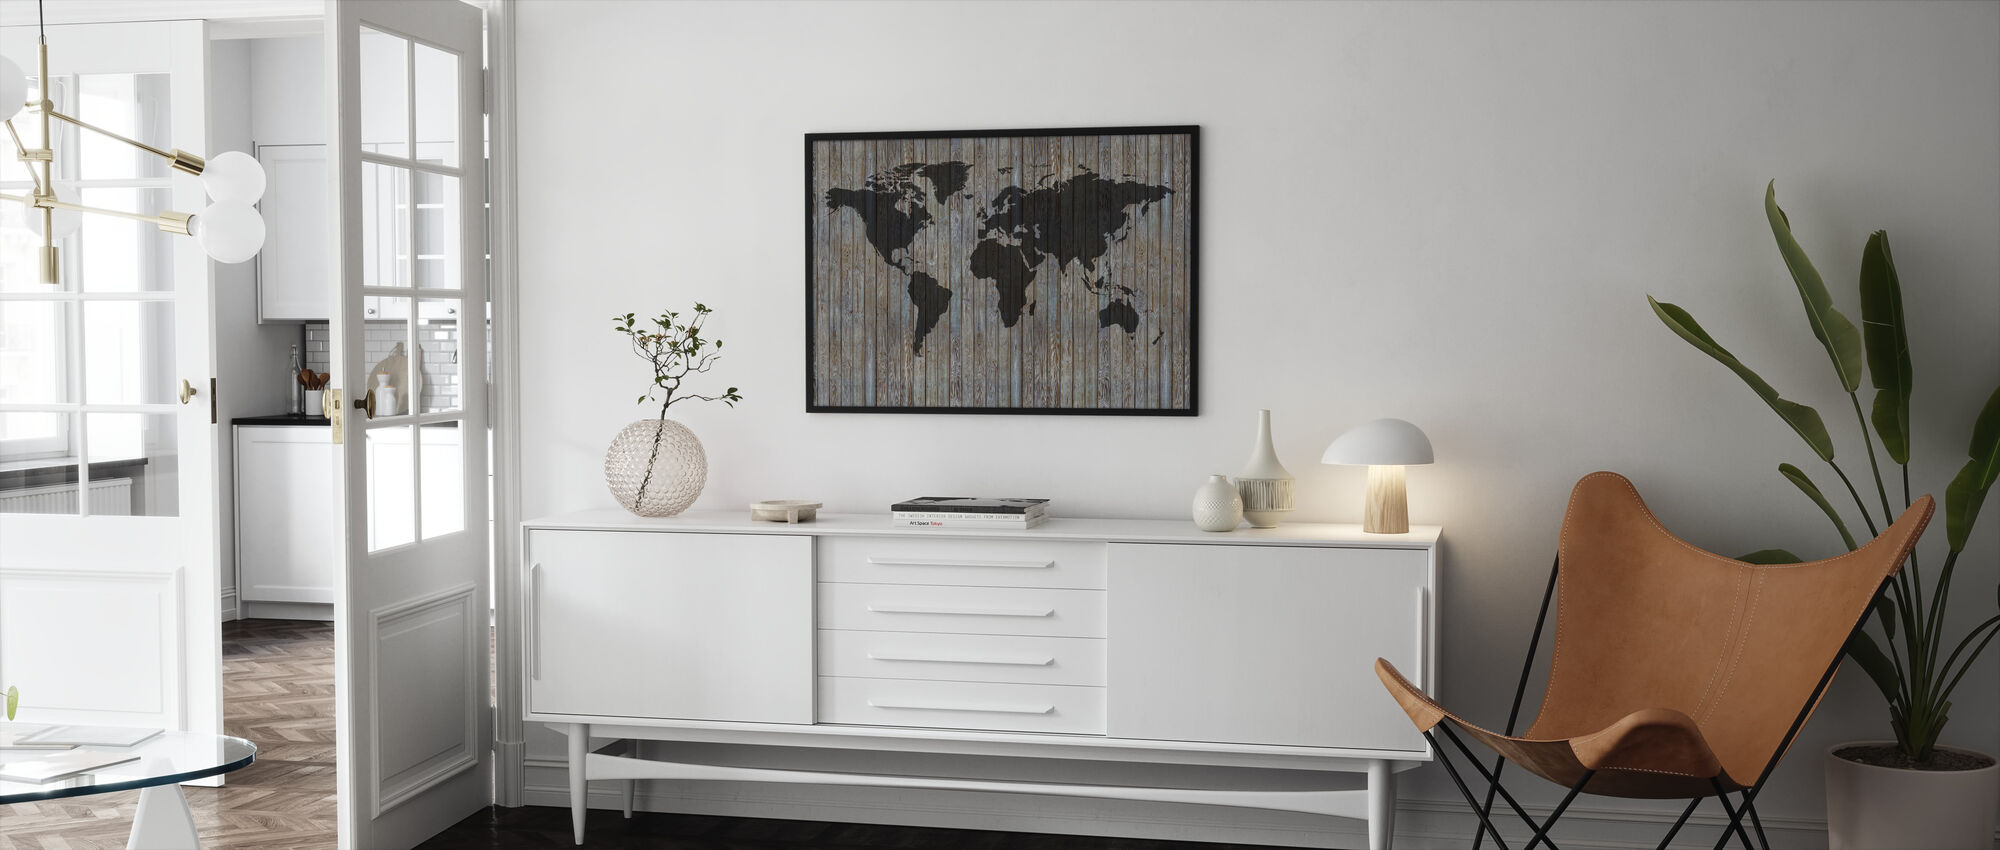 World Map Wooden Plank - Old Silver - Framed print - Living Room